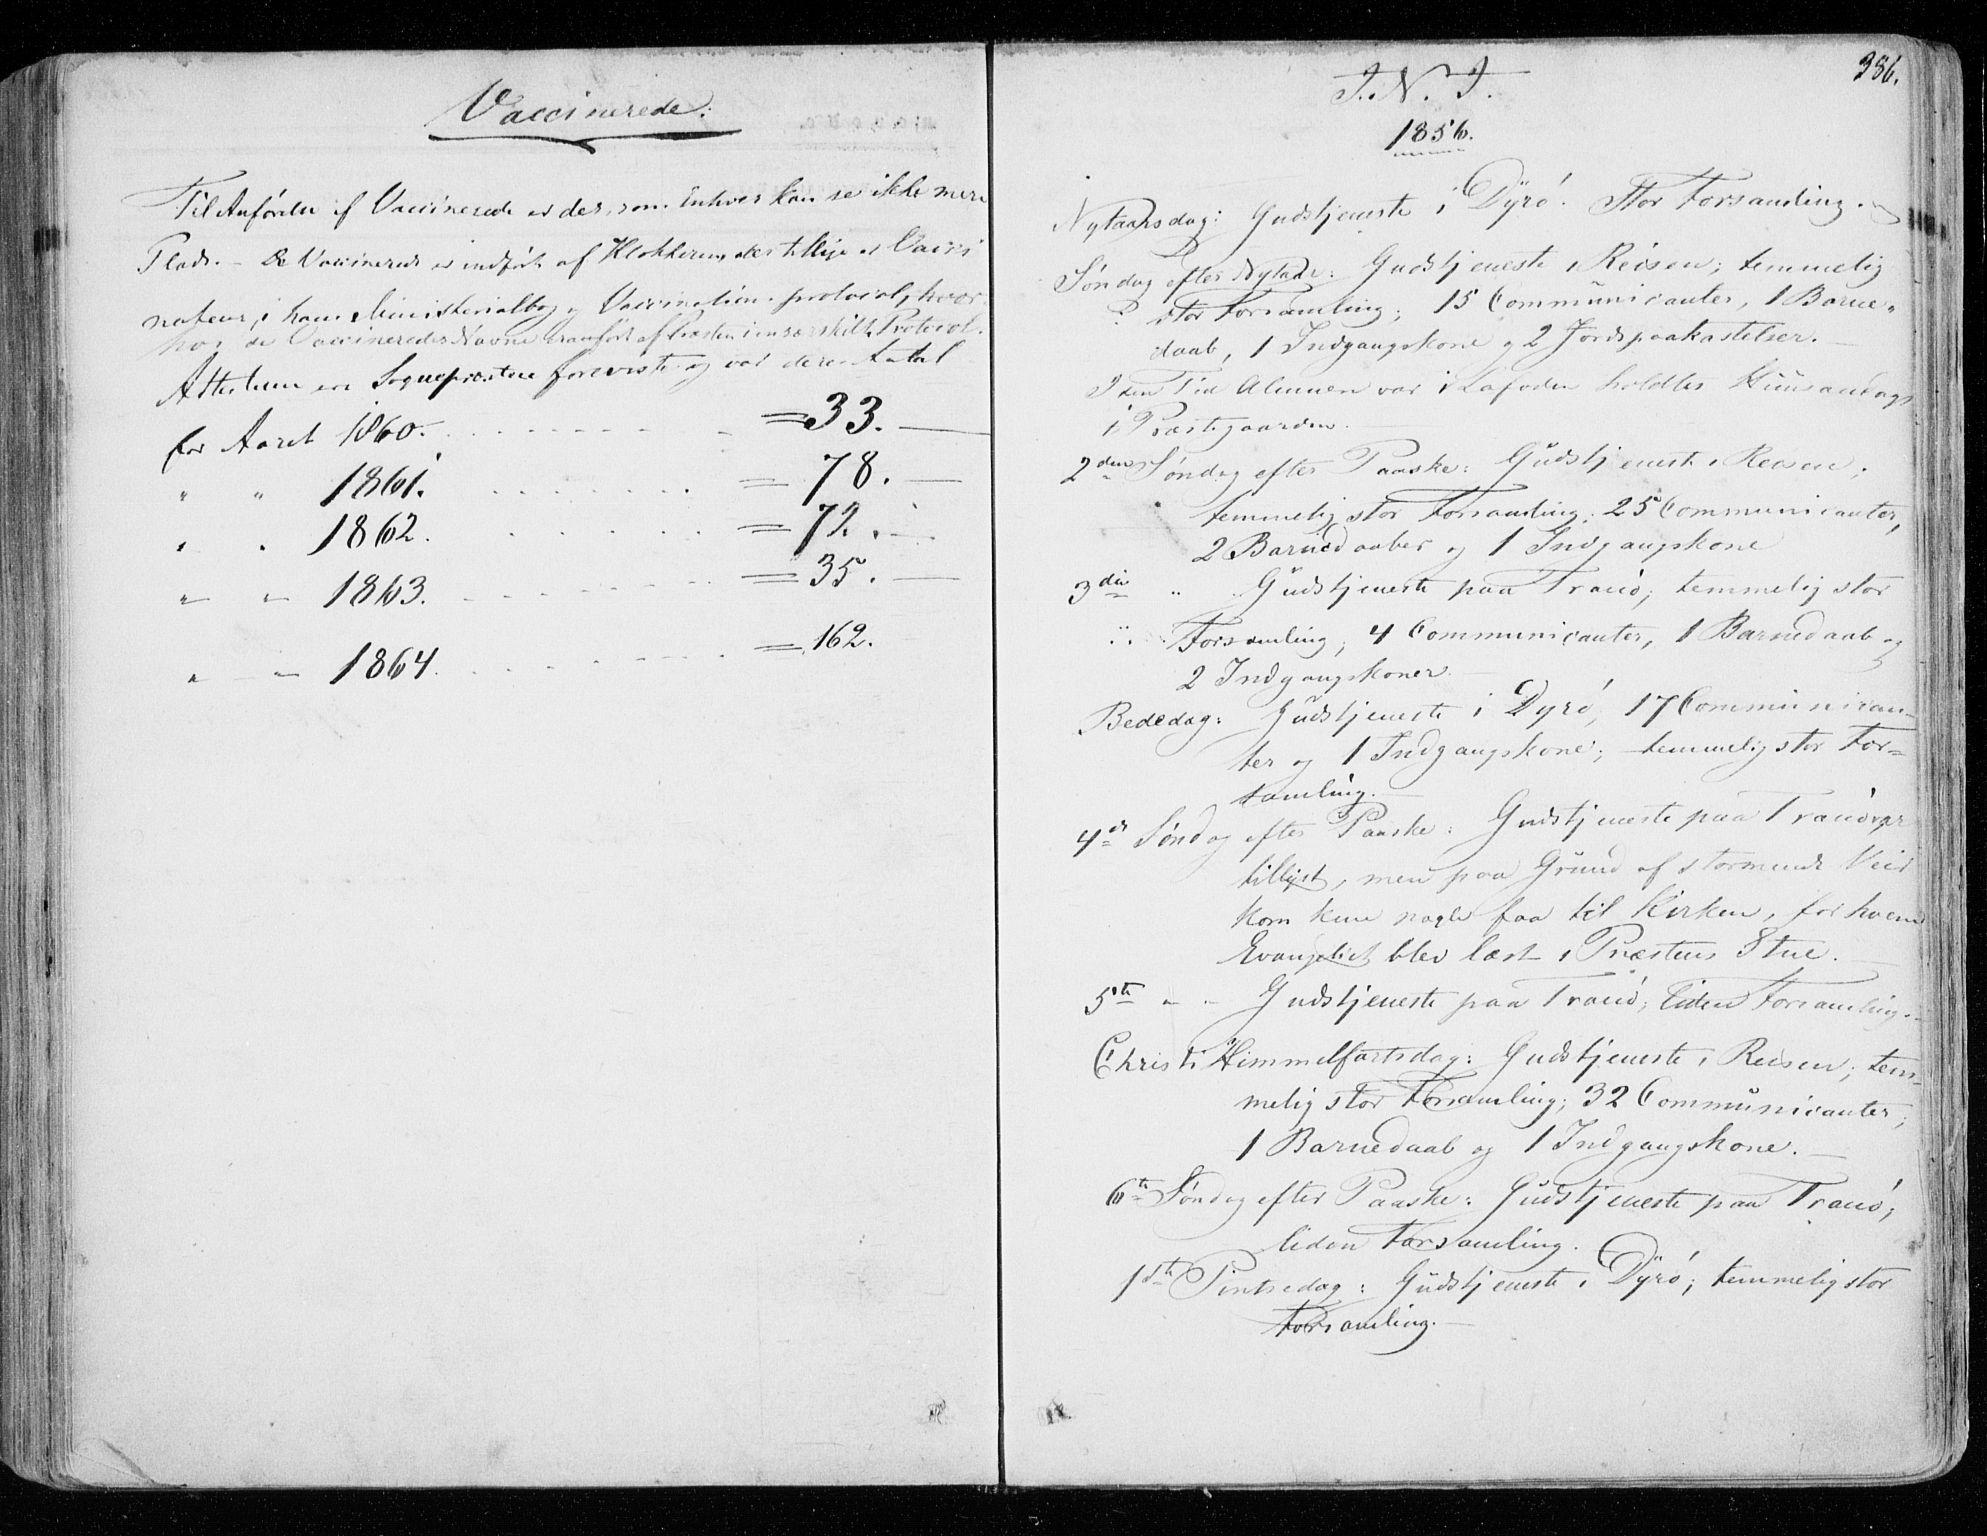 SATØ, Tranøy sokneprestkontor, I/Ia/Iaa/L0007kirke: Ministerialbok nr. 7, 1856-1866, s. 386